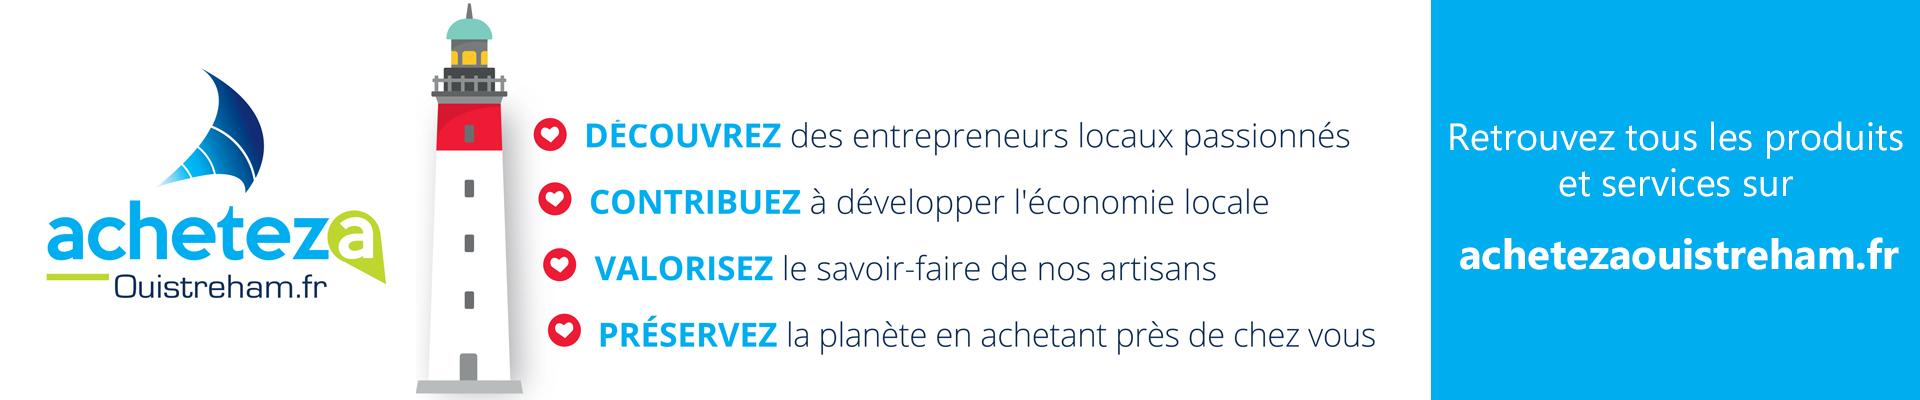 Achetezaouistreham.fr